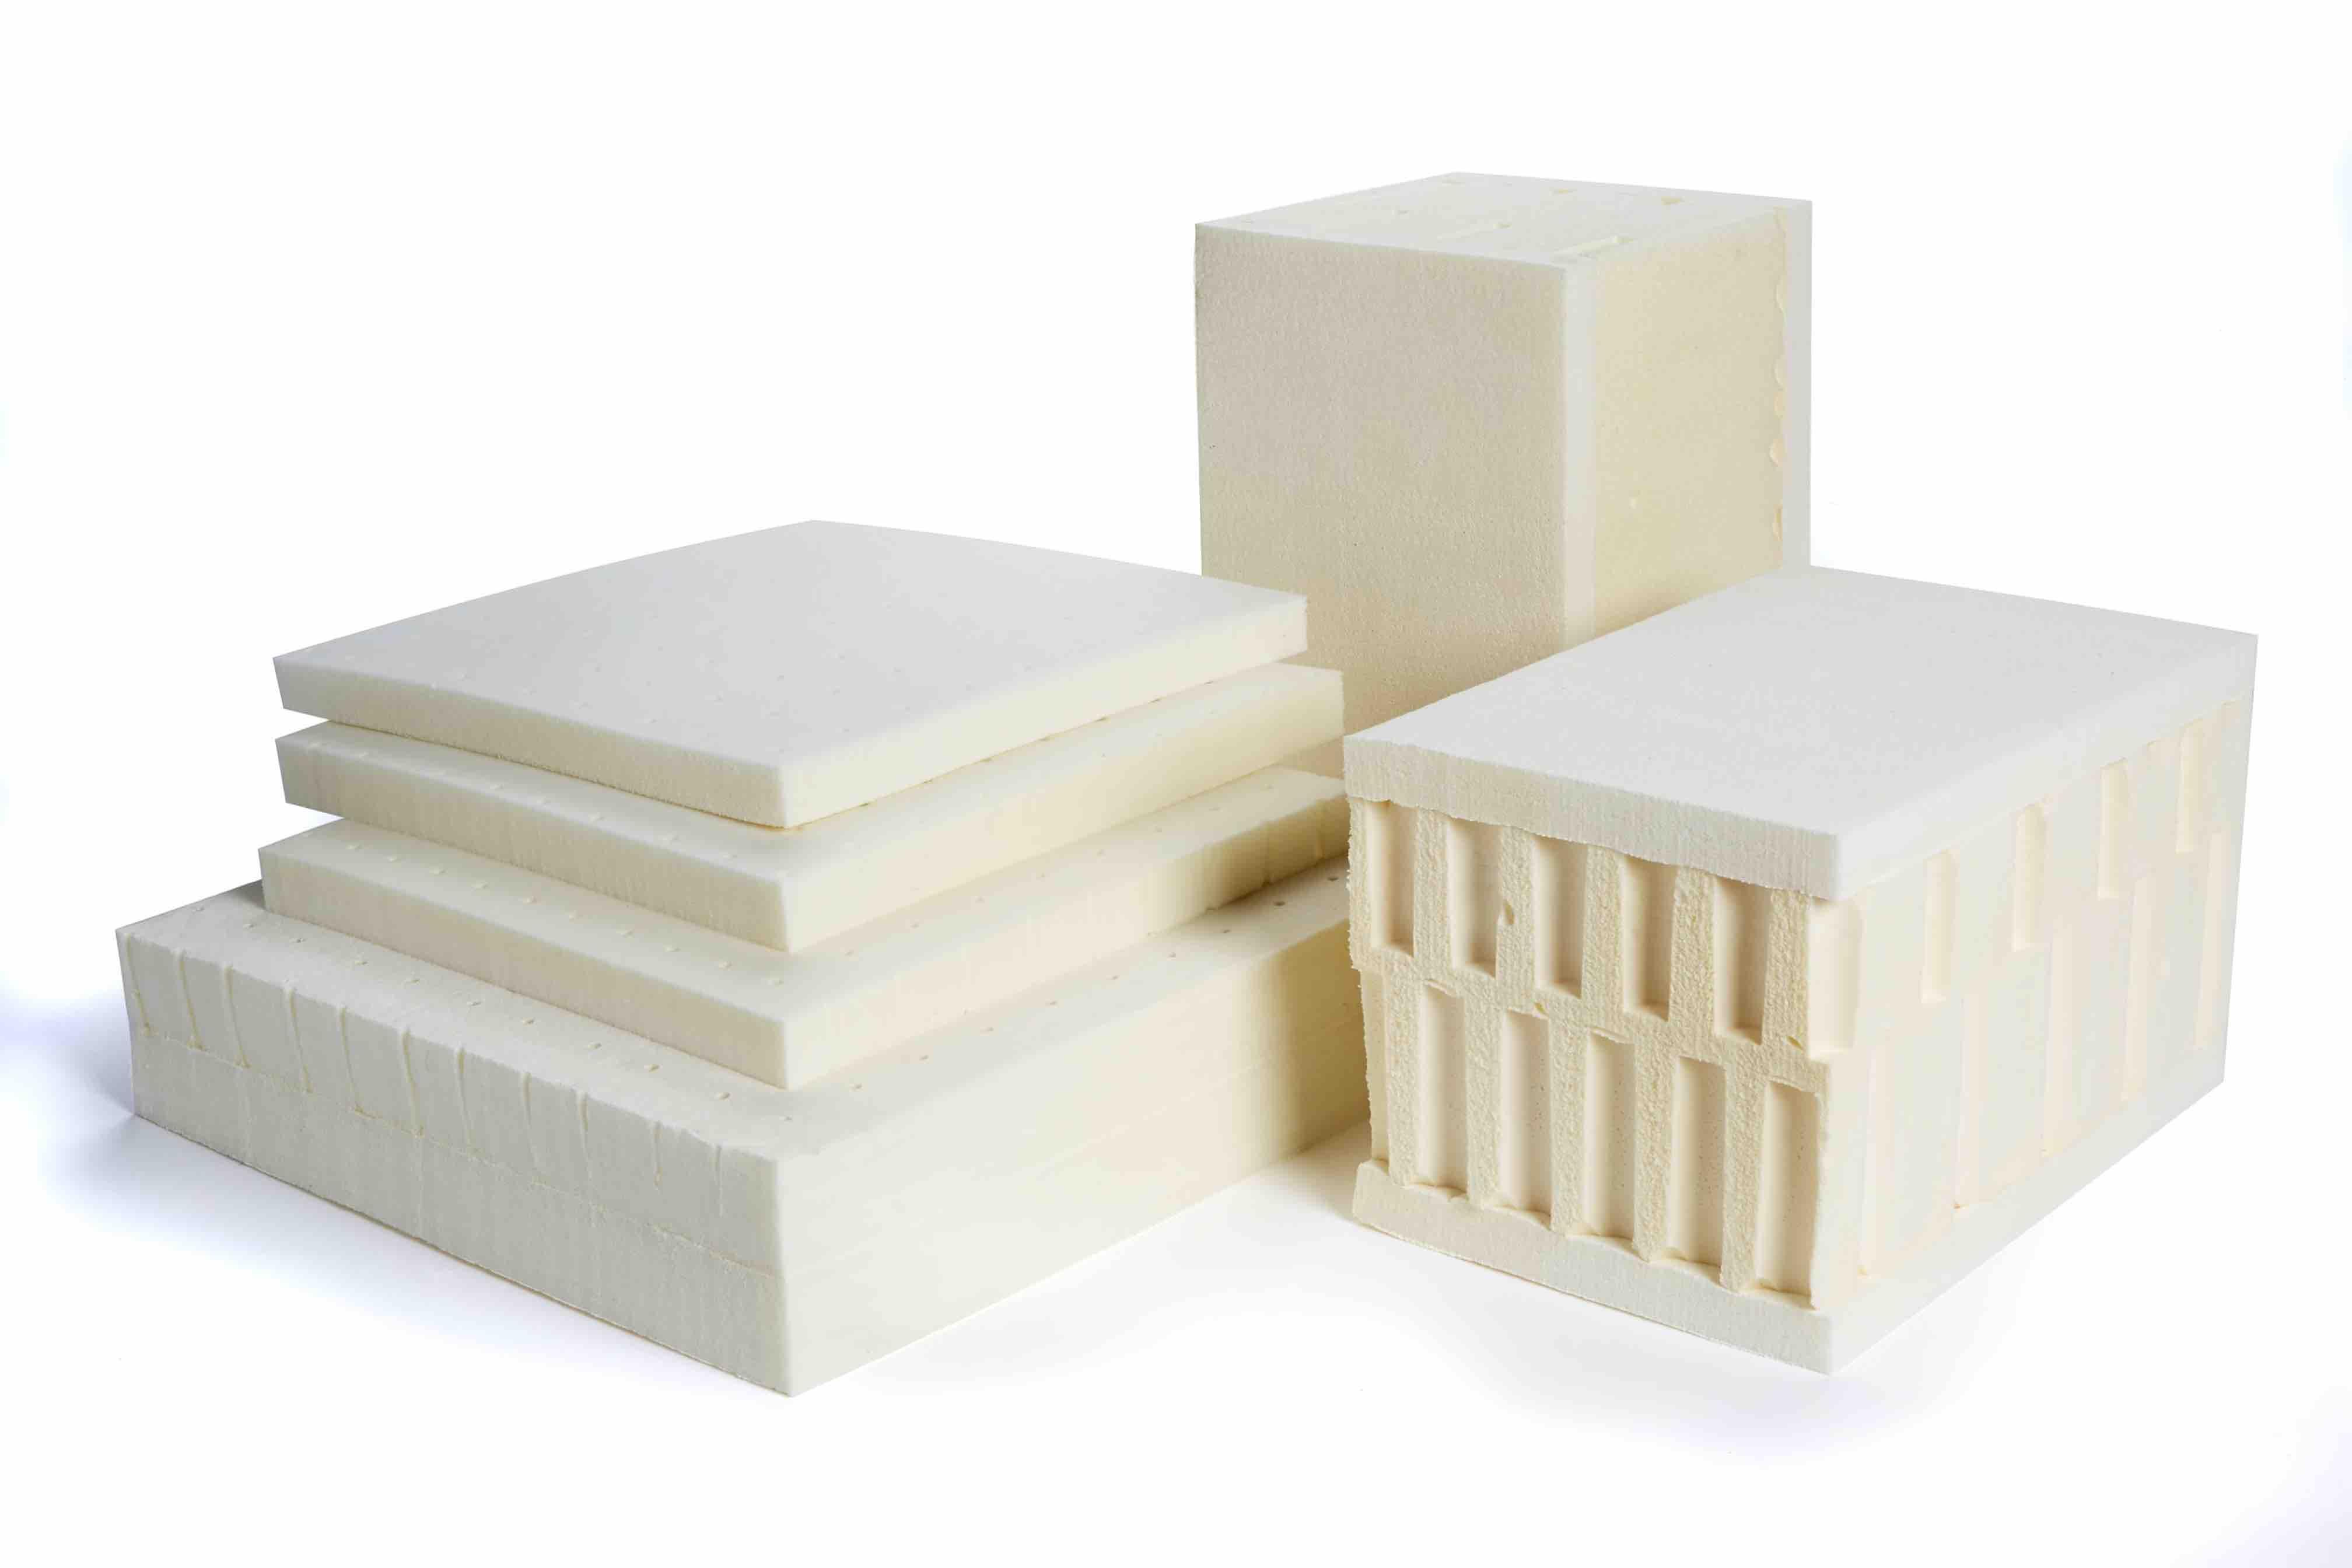 latex mattress topper grouo